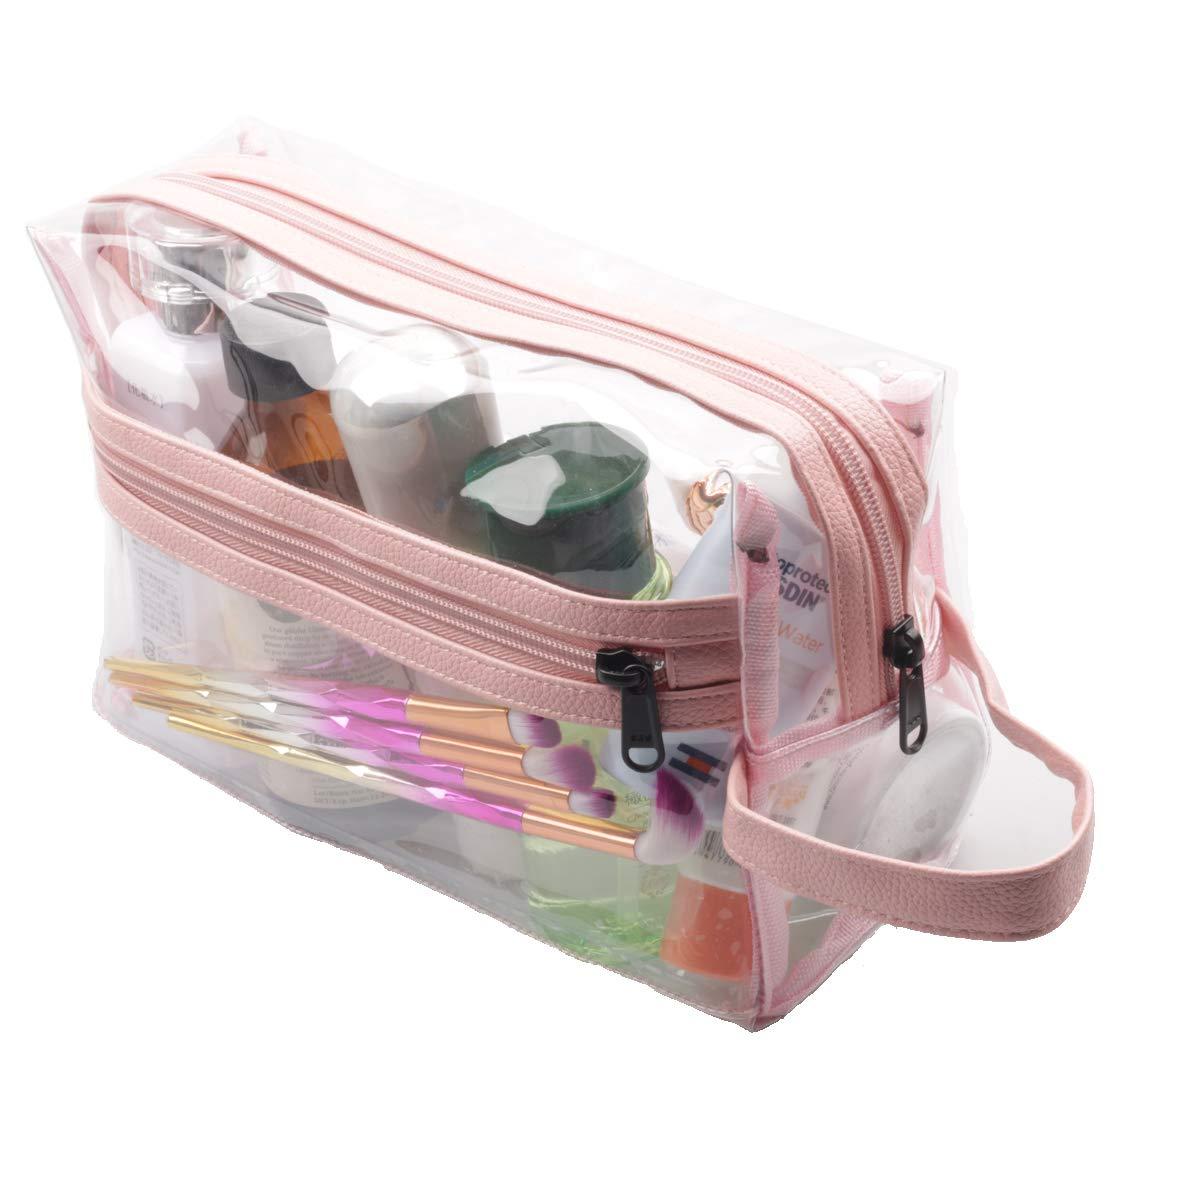 8 Year Exporter Children School Bag Girls - Carry On Compliant Bag – Twinkling Star